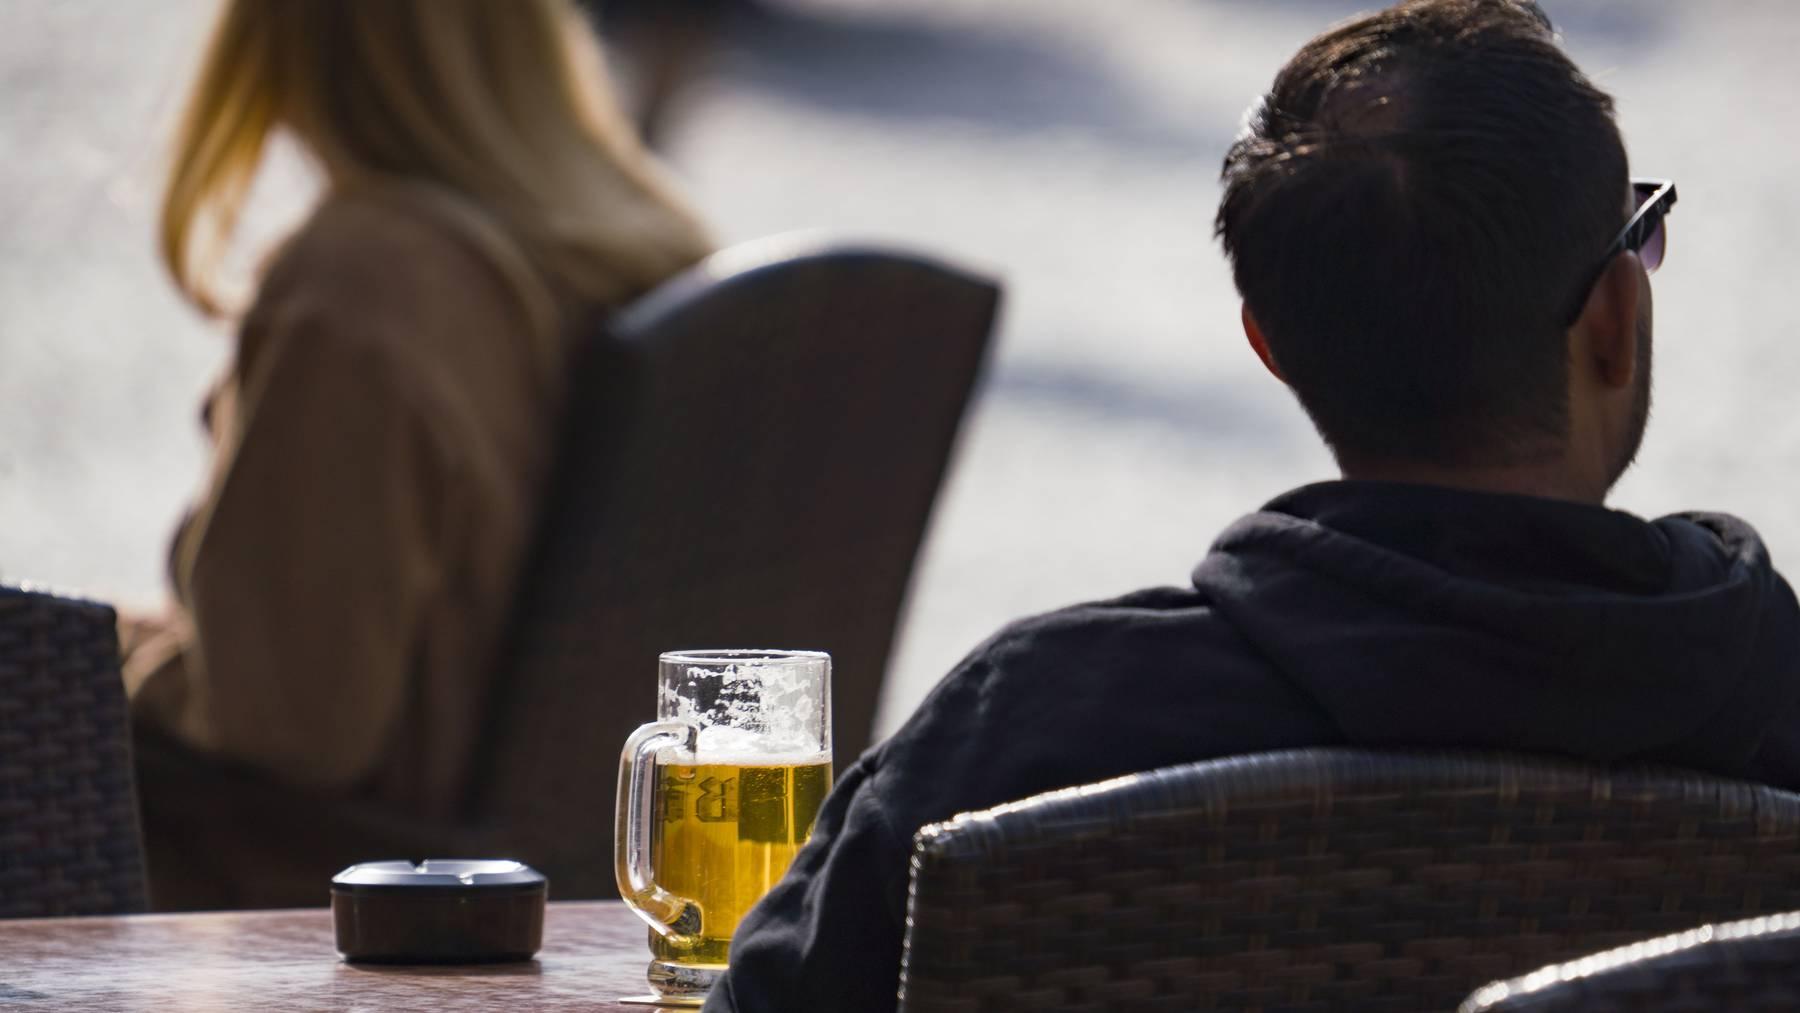 Corona-Krise wird zur Bier-Krise